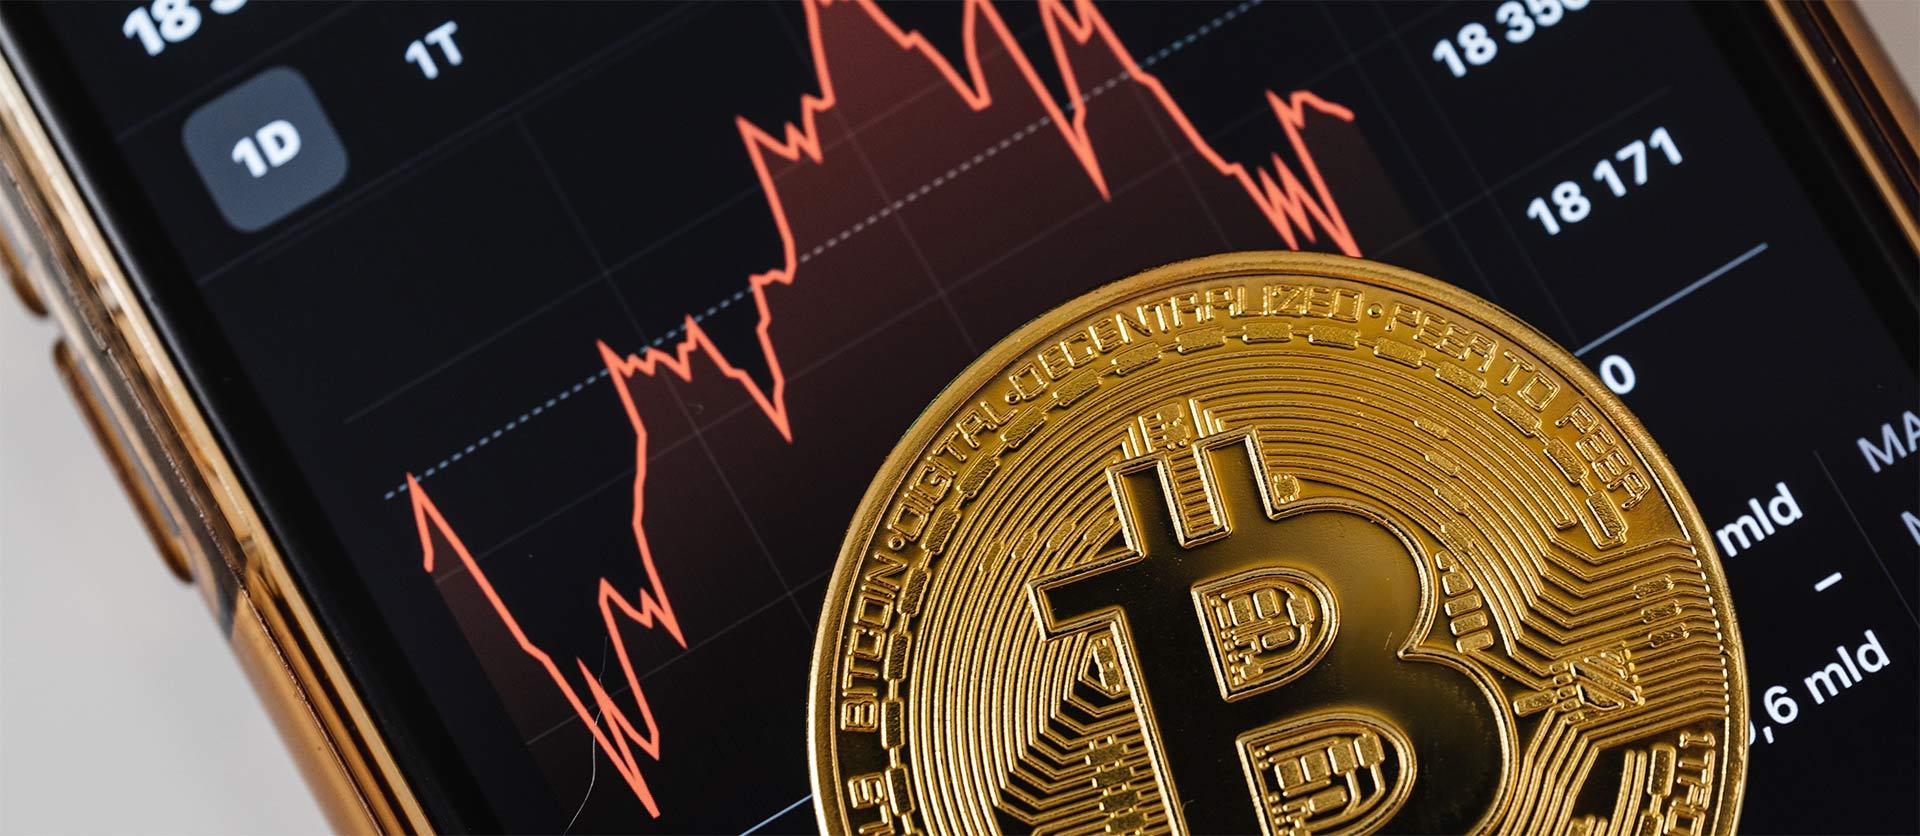 Exponencial-Confirming-Affirmatum-Colombia-Criptomoneda-Bitcoin-valor